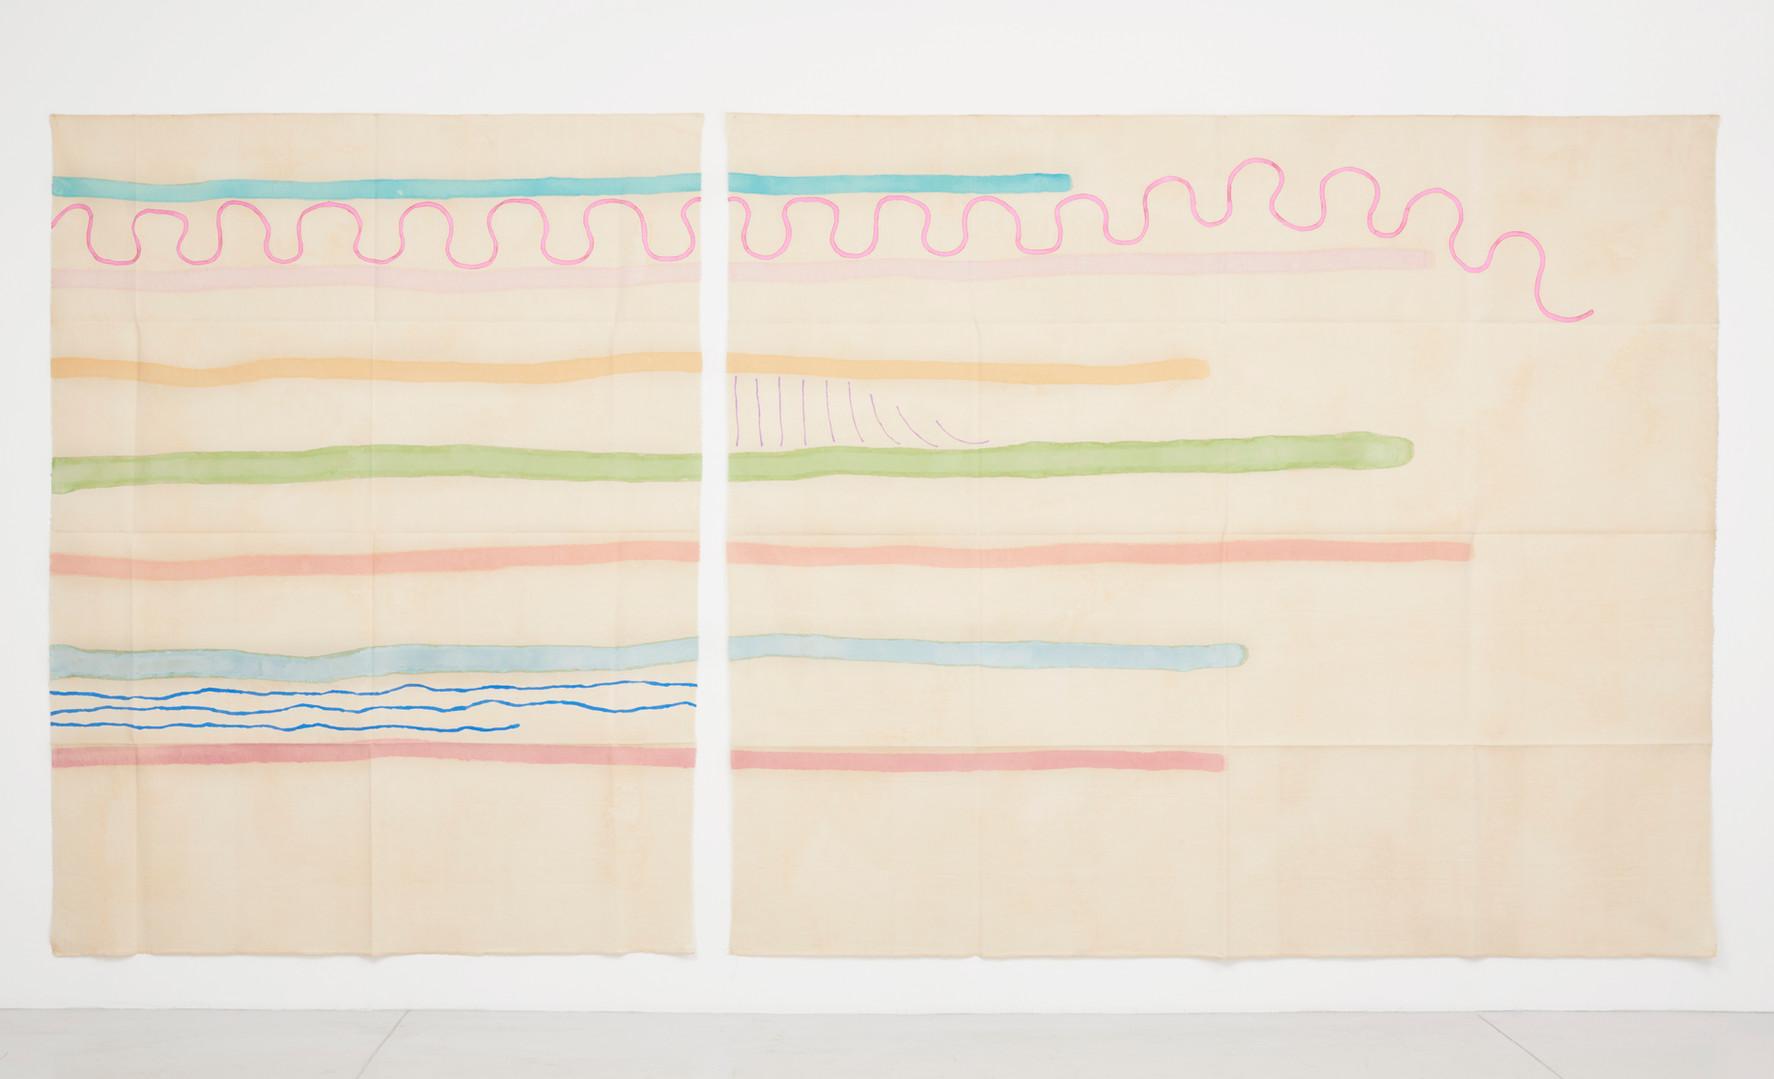 "Giorgio Griffa Dittico lieve odulaato, 1996 Acrylic on canvas 92.9 x 189"" / 236 x 480cm Photo: David Schulze ©Giorgio Griffa Image courtesy the artist and Casey Kaplan, New York."